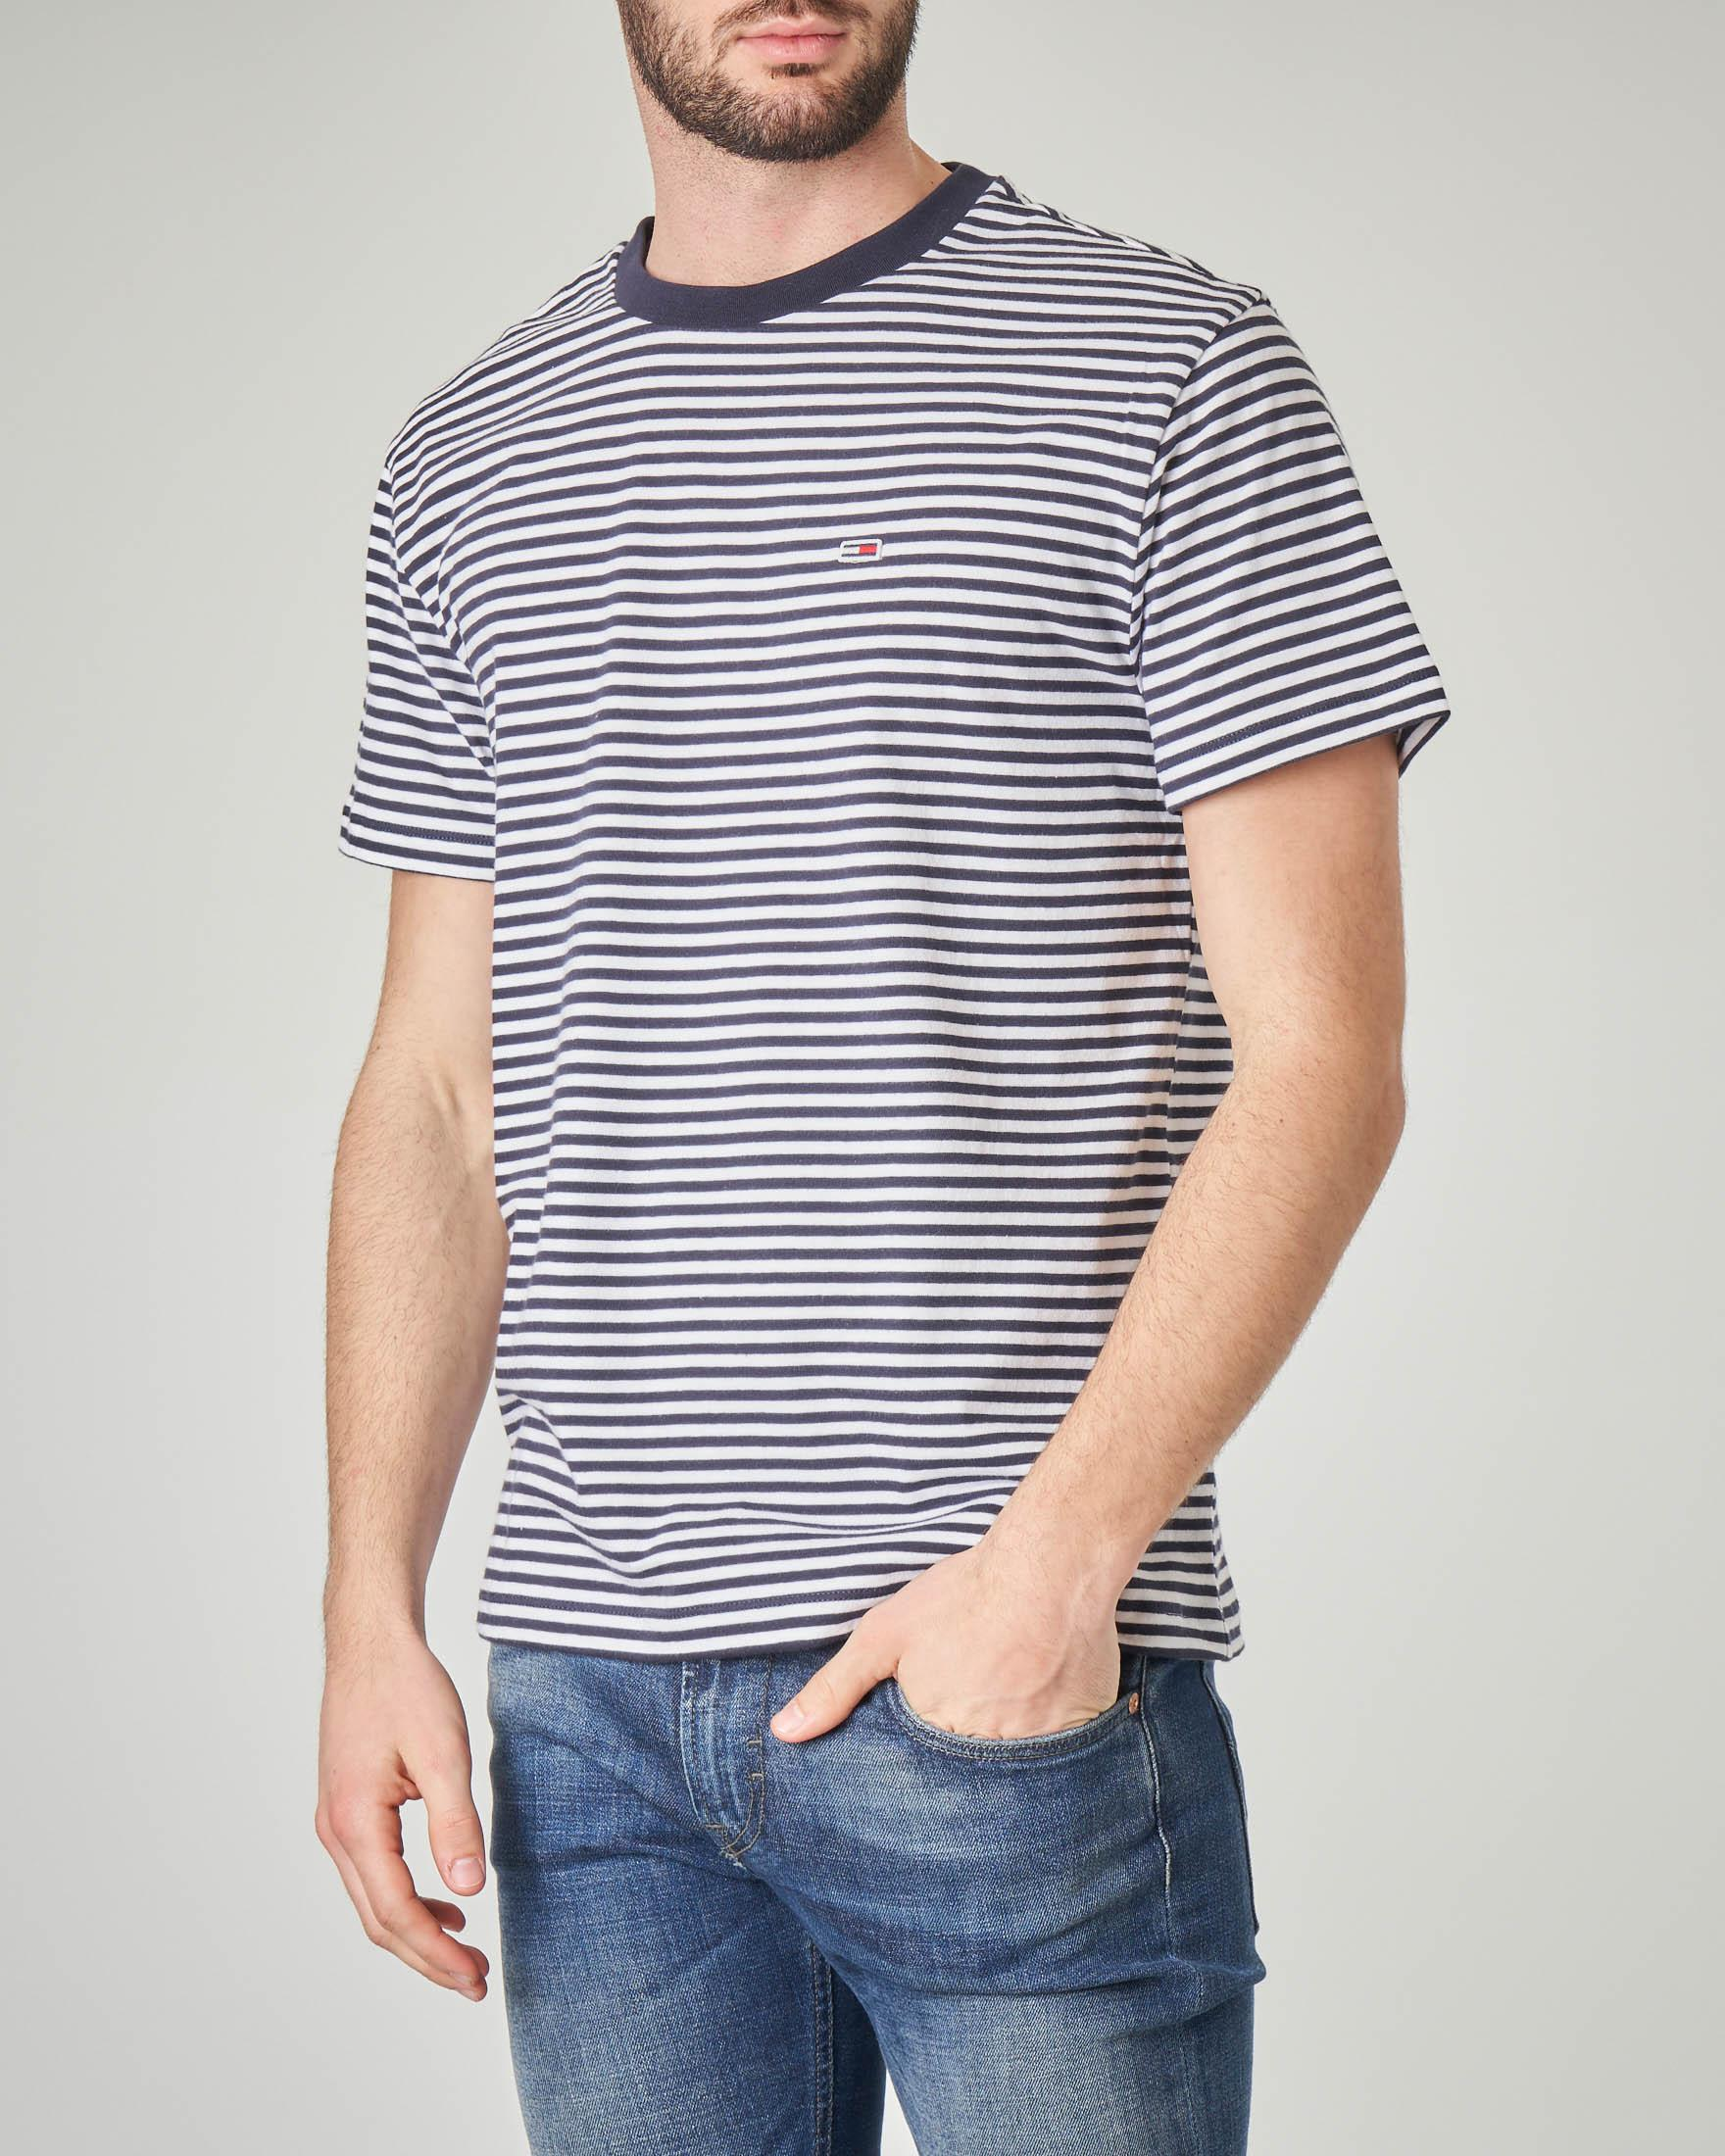 T-shirt a righe bianche e blu orizzontali